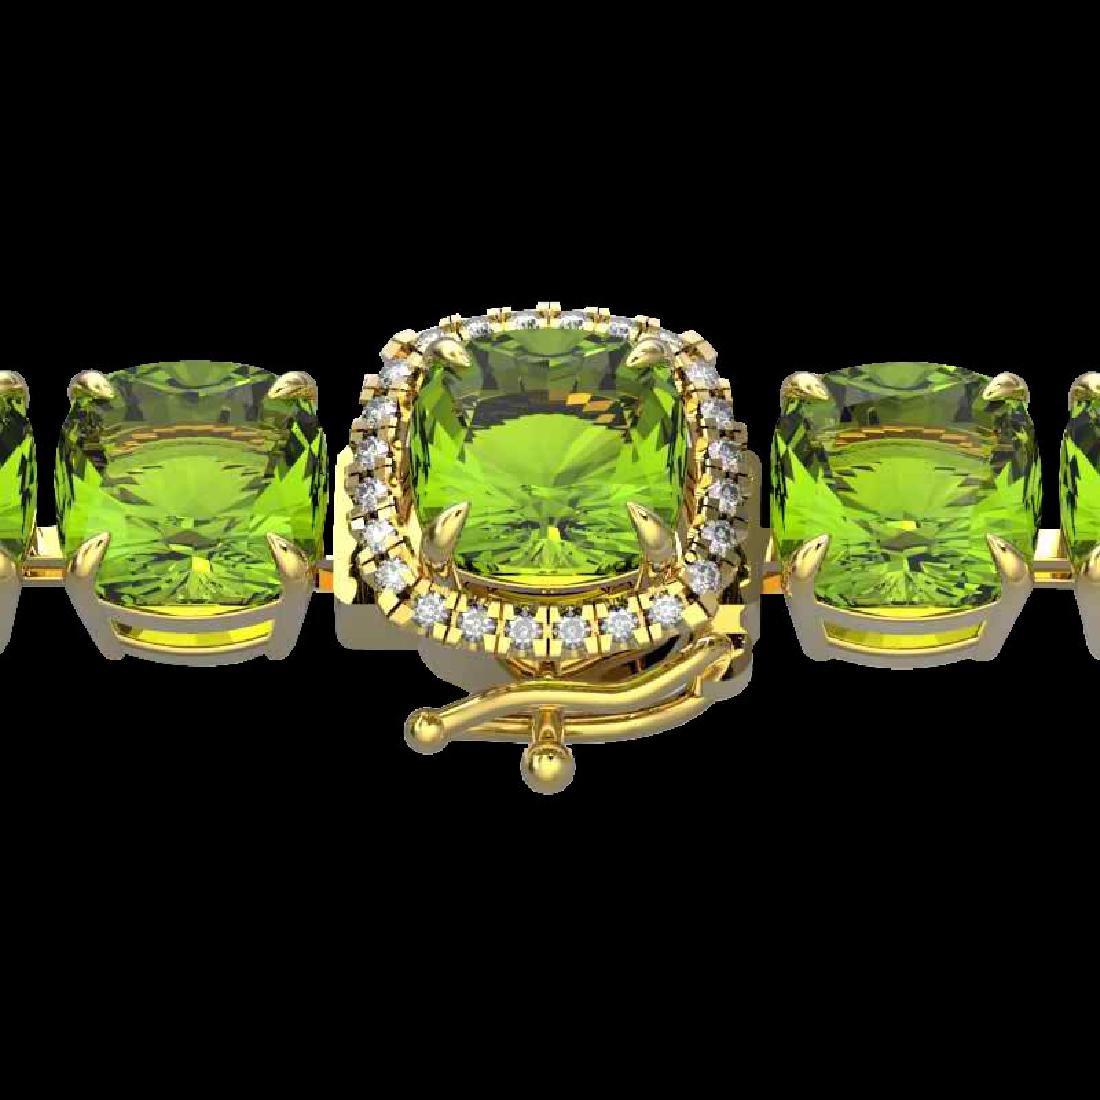 40 CTW Peridot & Micro Pave VS/SI Diamond Halo Bracelet